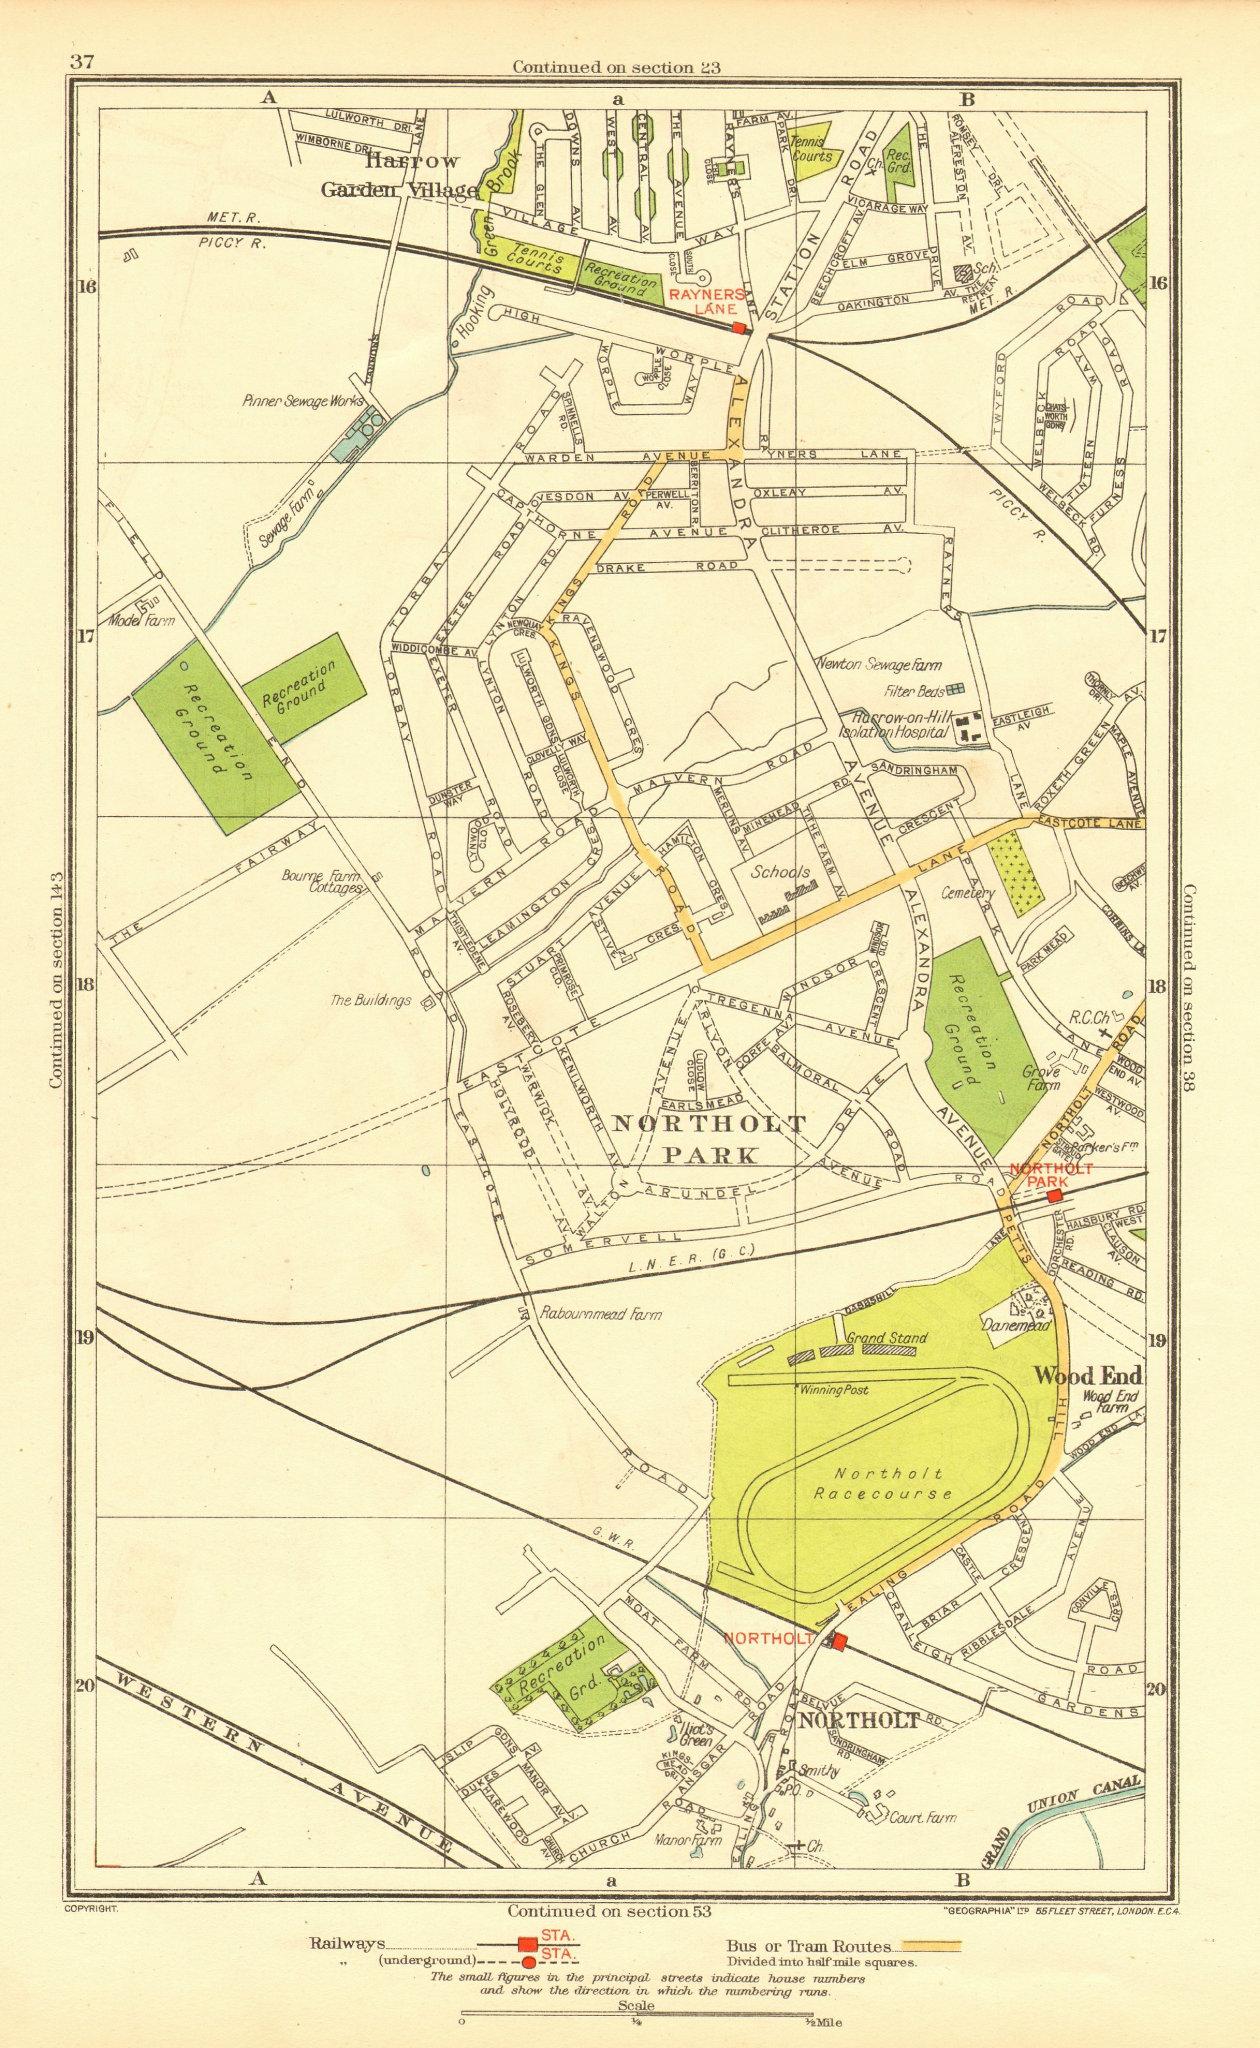 Associate Product NORTHOLT. South Ruislip Harrow Rayner's Lane Wood End Northolt Park 1937 map